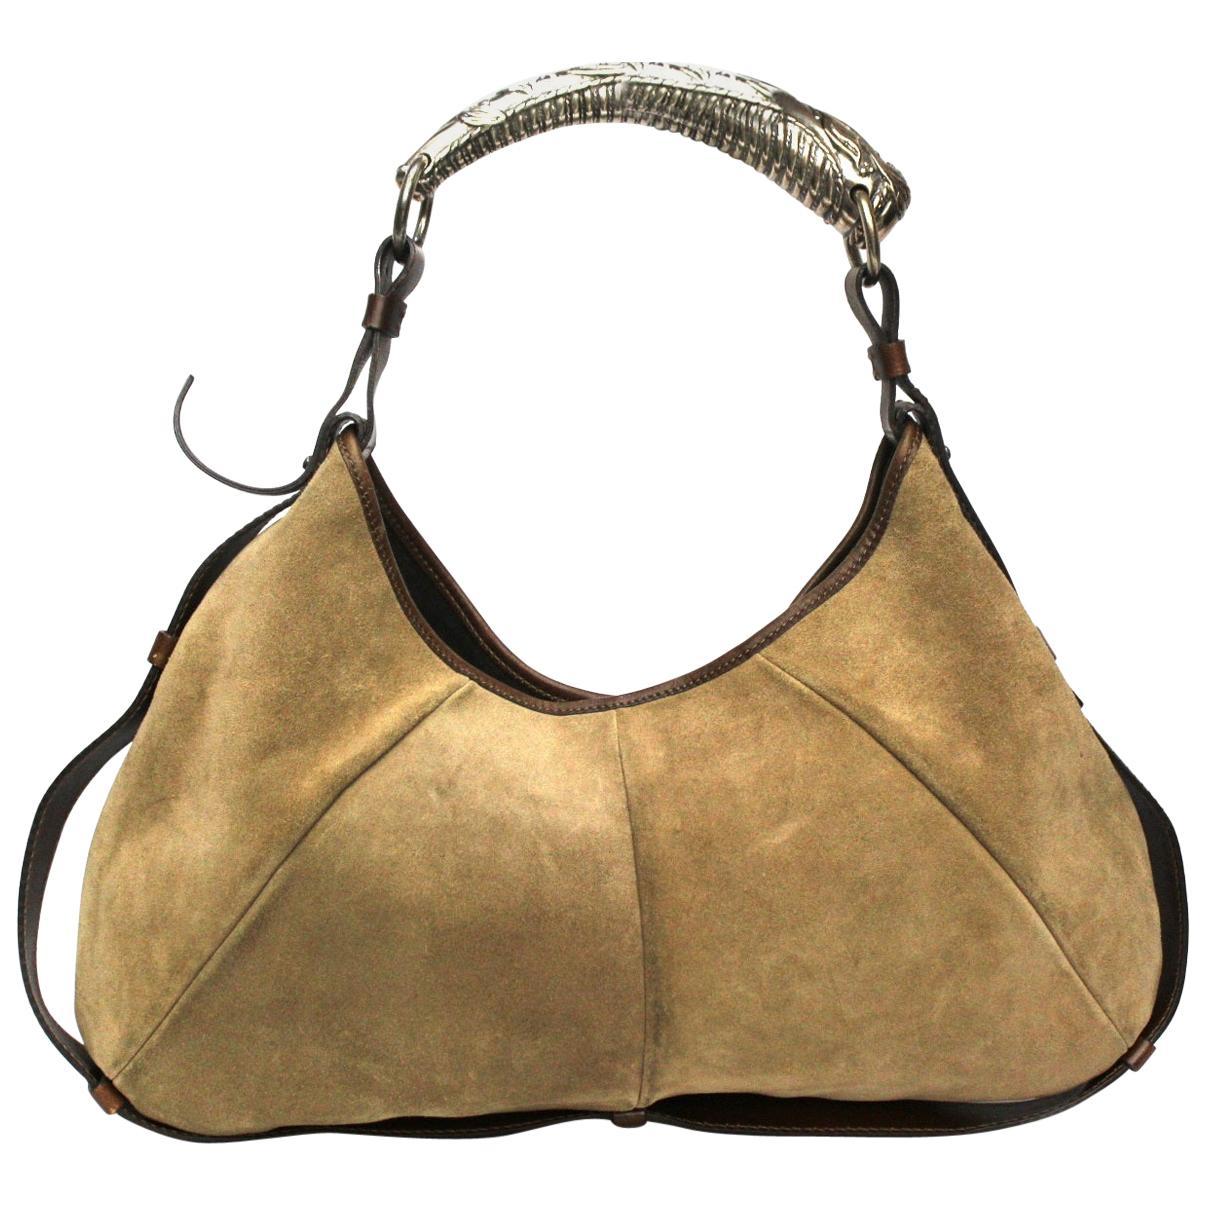 YSL Beige Leather/Suede Mombasa Bag